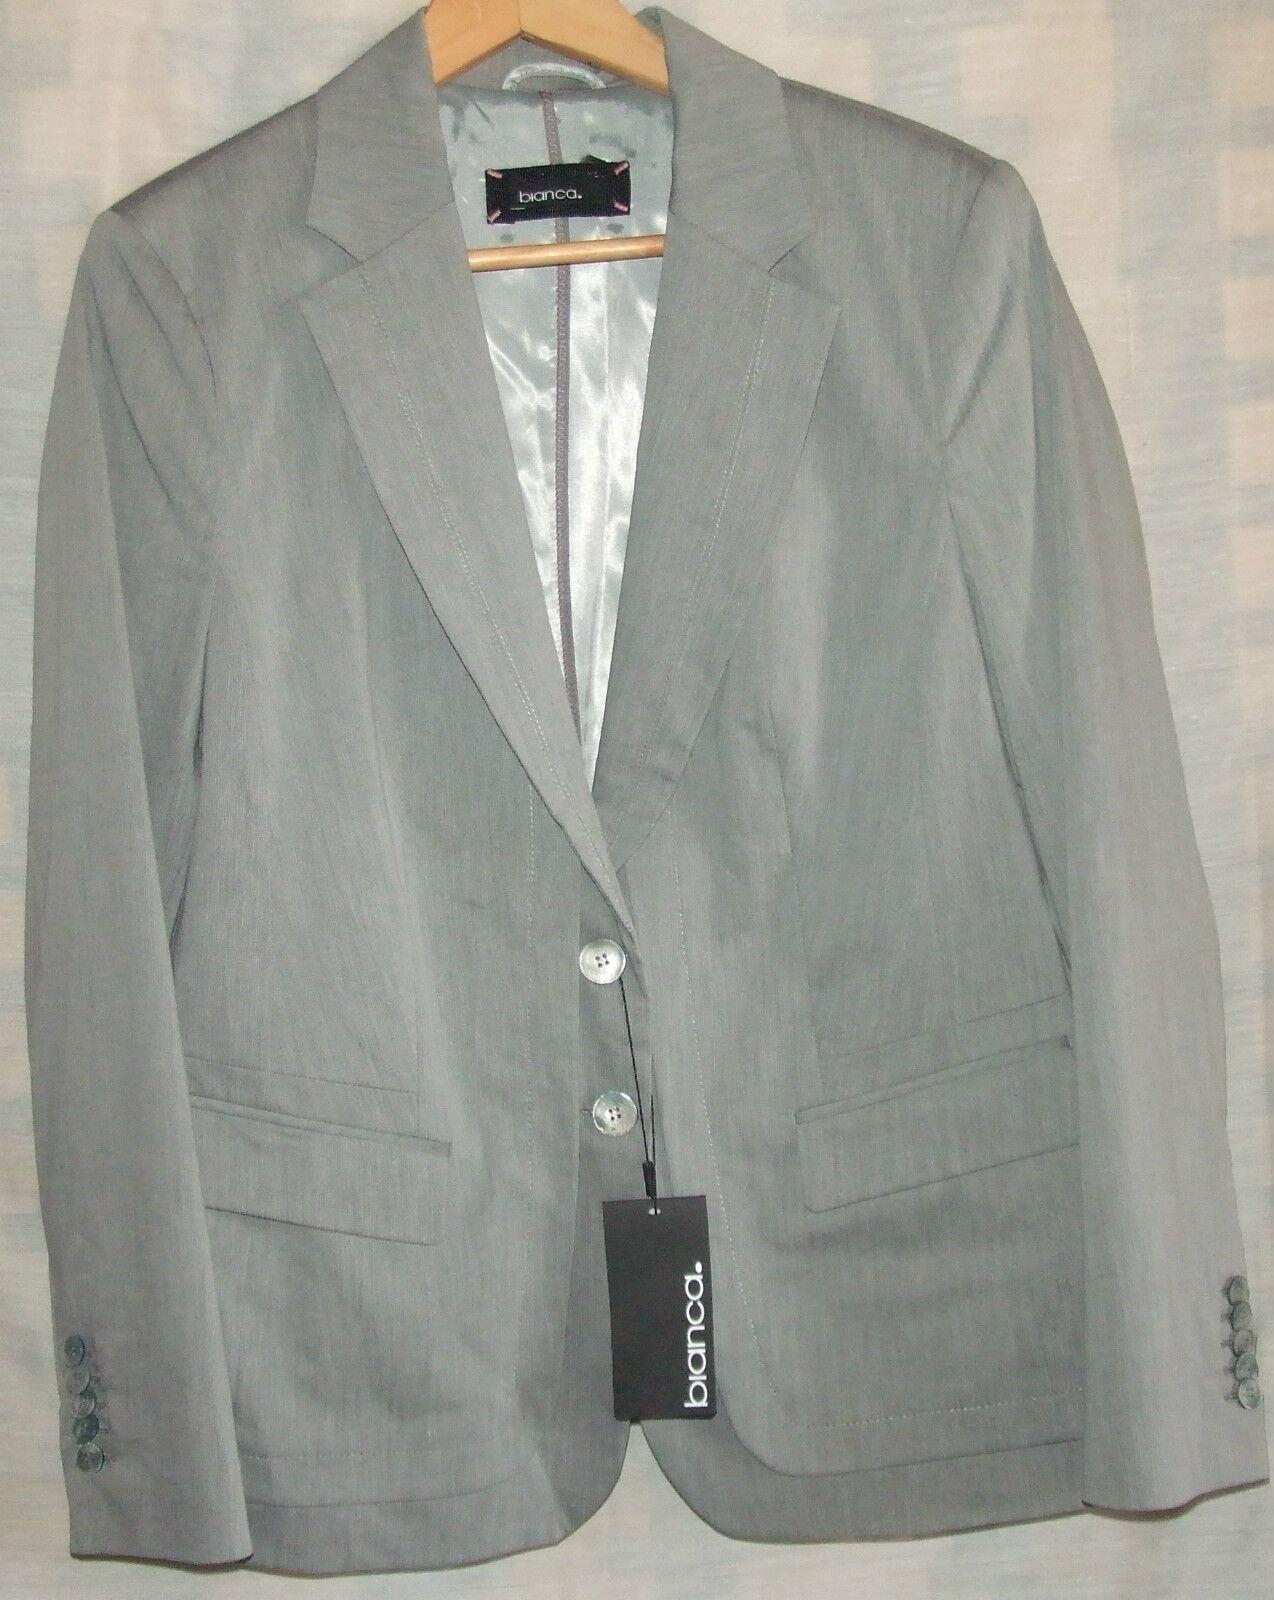 white VESTE greyE MANCHES LONGUES size 44 EN COTON ET POLYESTER